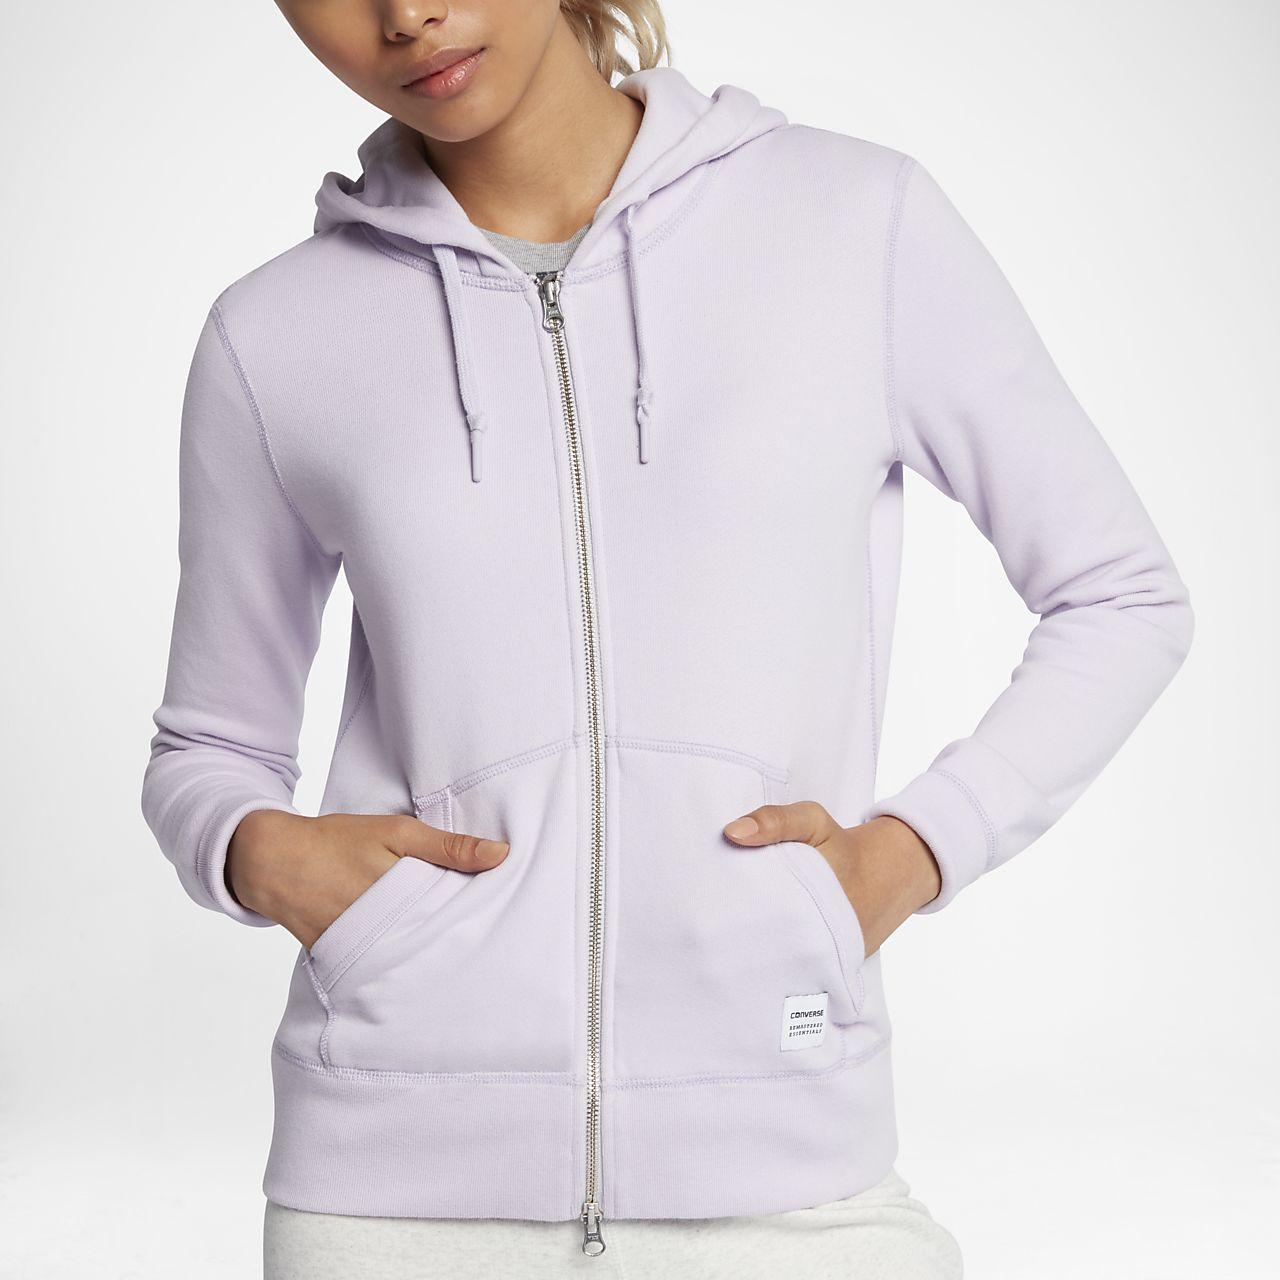 Converse Essentials Sportswear Full-Zip Women's Hoodie